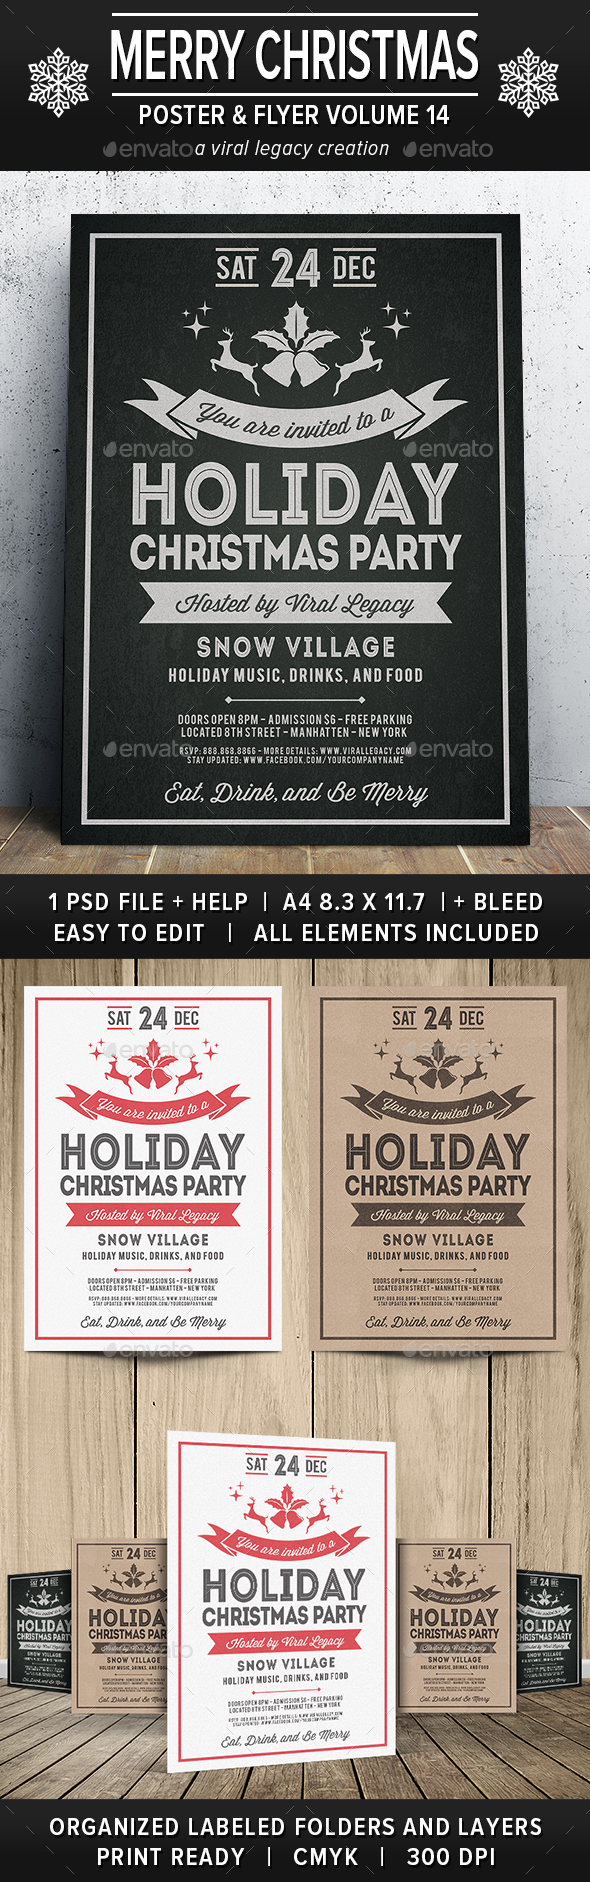 Merry Christmas Poster / Flyer V14 - Print Templates